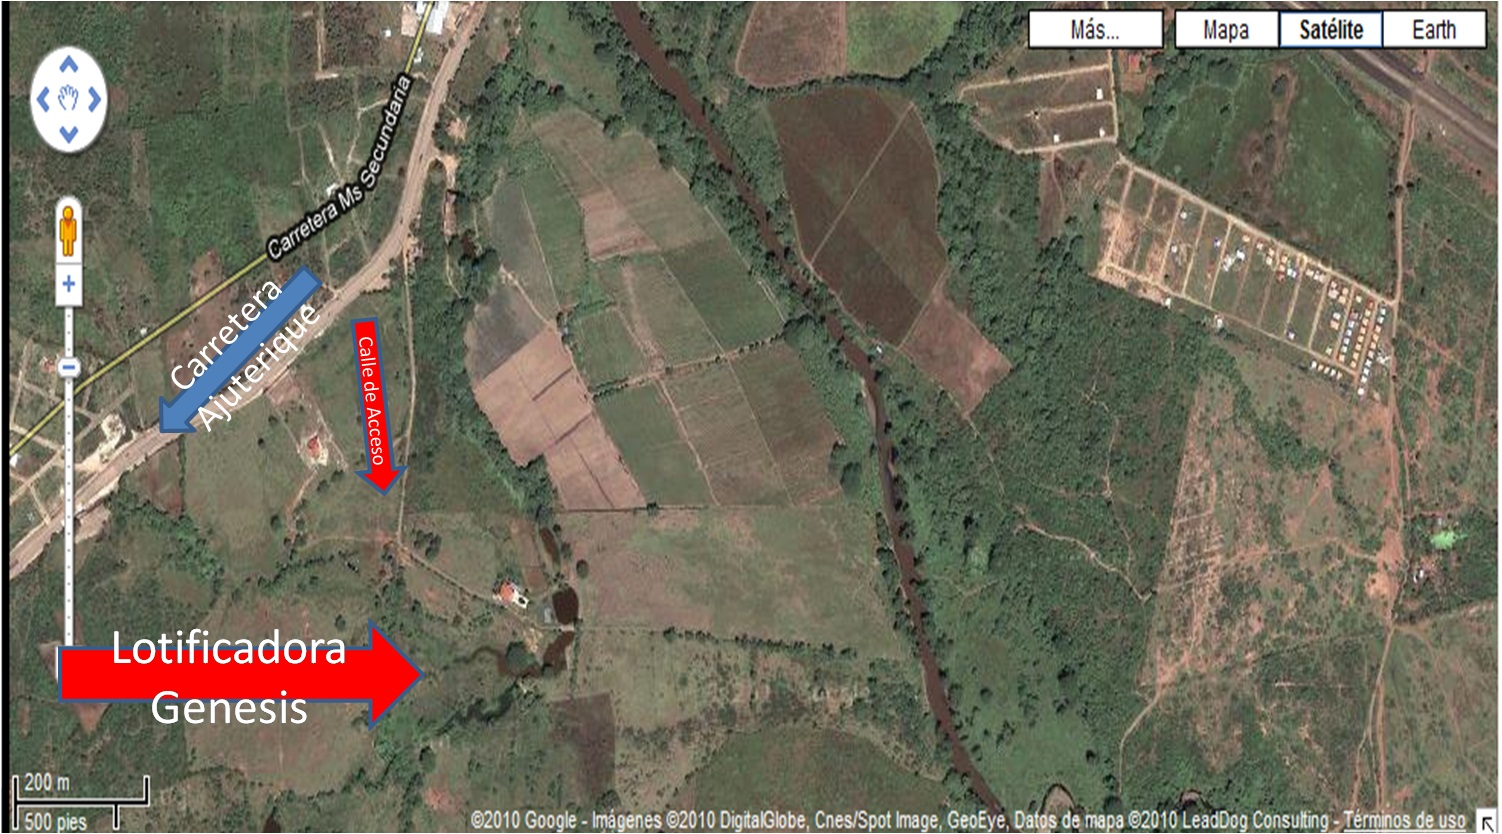 venta de terrenos en comayagua: Plano de Lotificadora